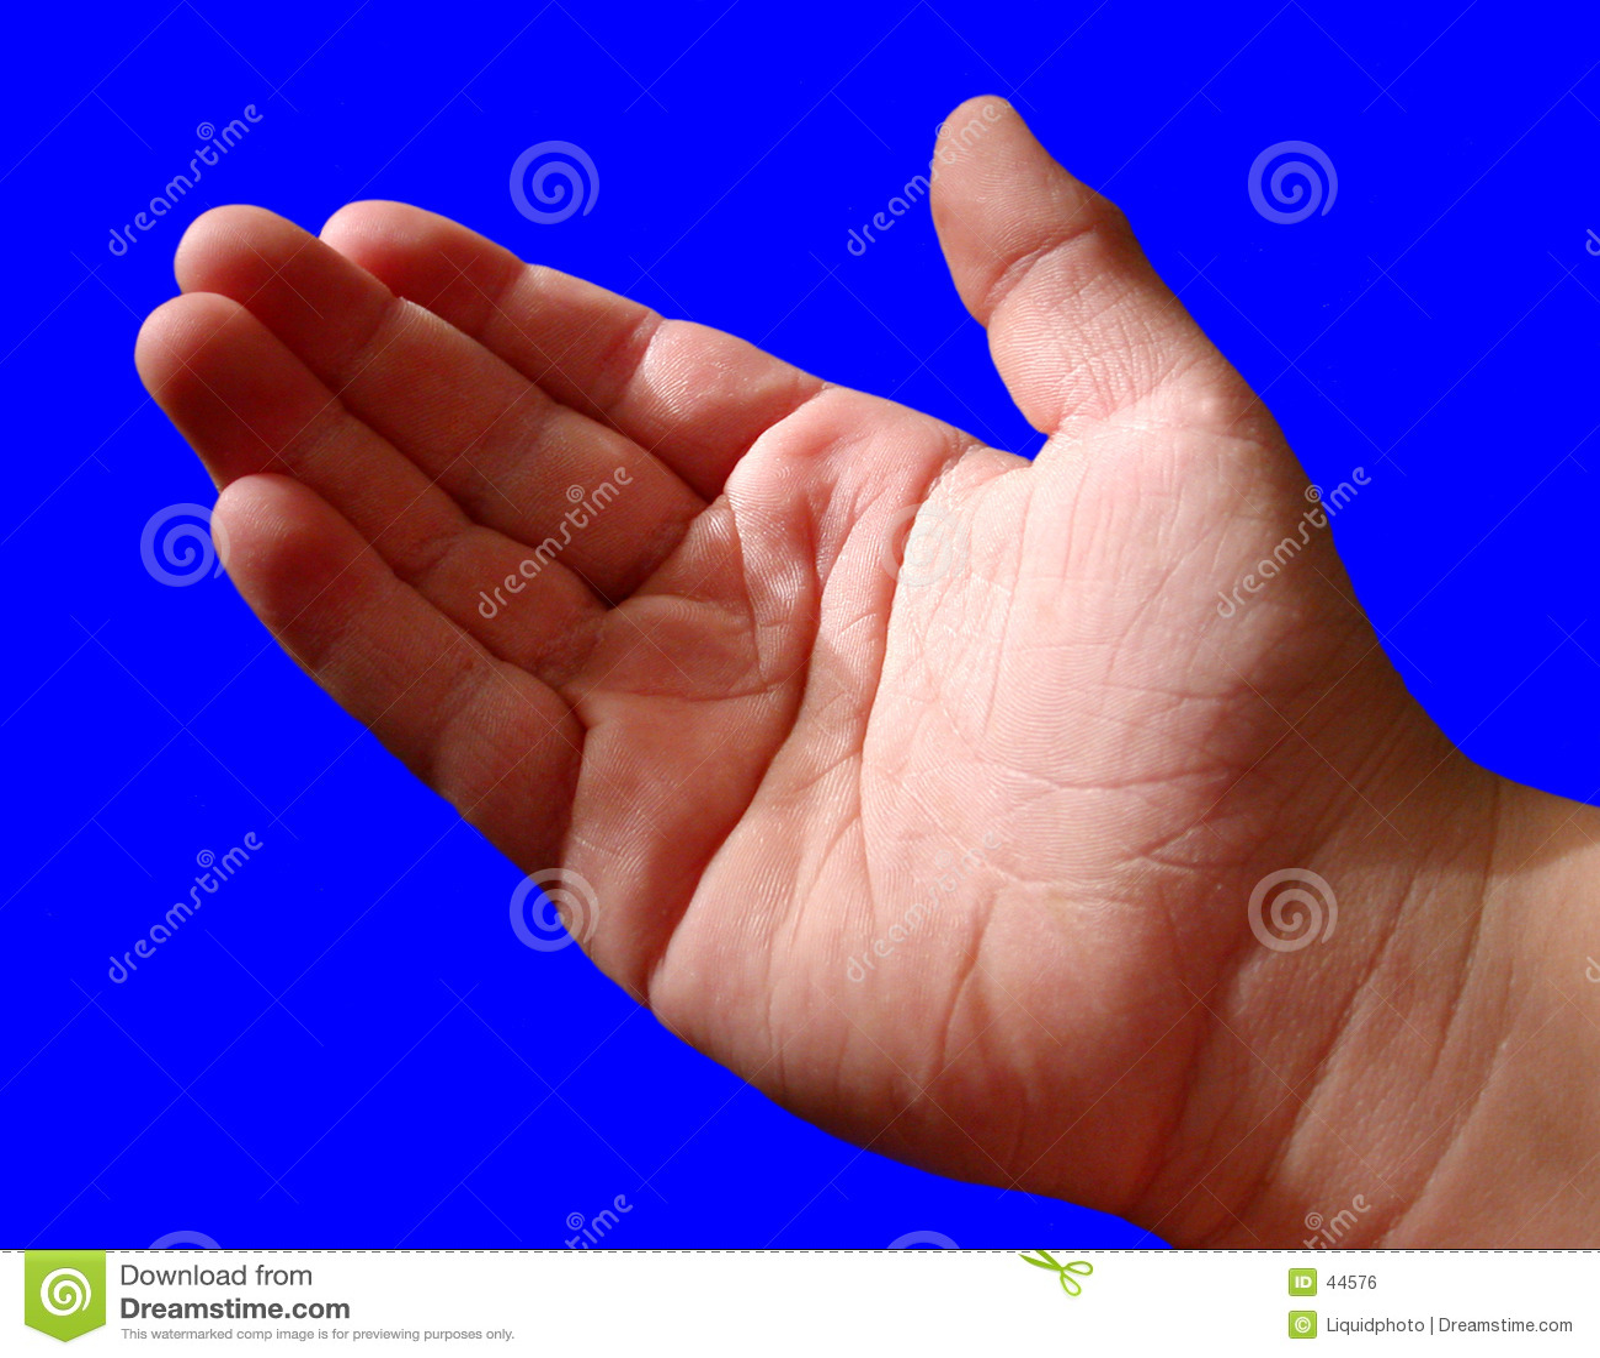 Download τα μπλε αγόρια δίνουν στοκ εικόνες. εικόνα από ελπίδα, ελάχιστα - 44576